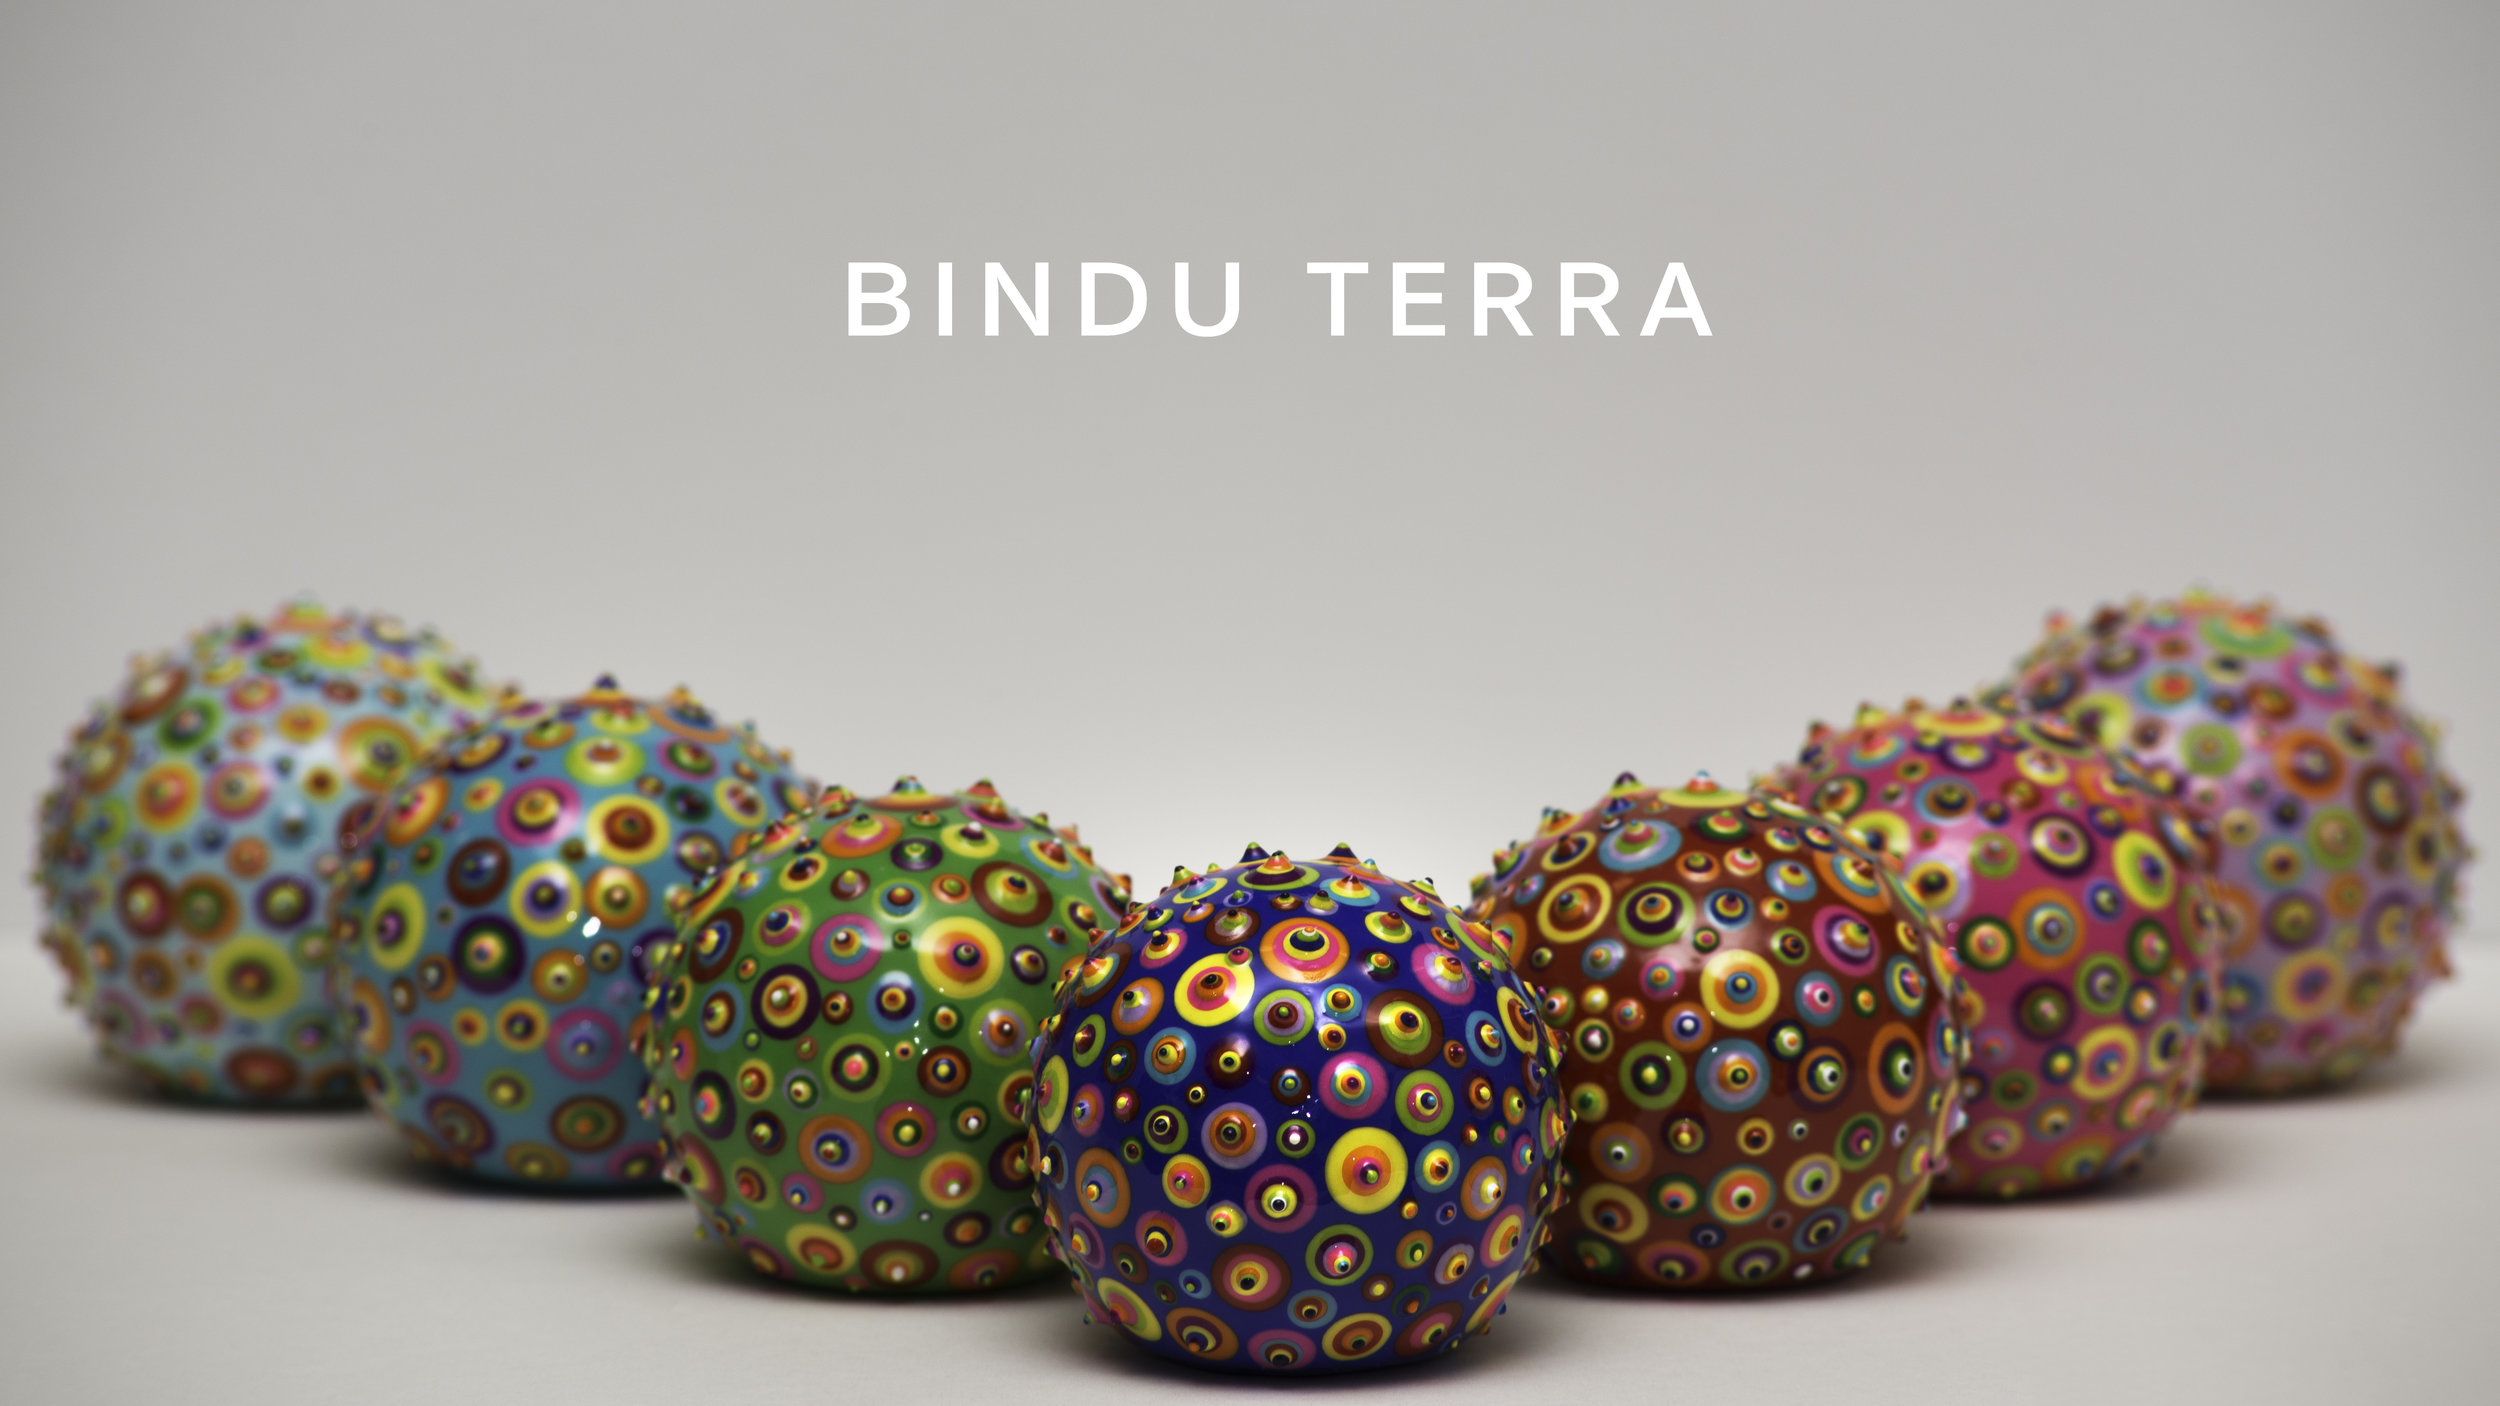 "Bindu Terra. 2"". Acrylic and resin on wood. 2016. SOLD"